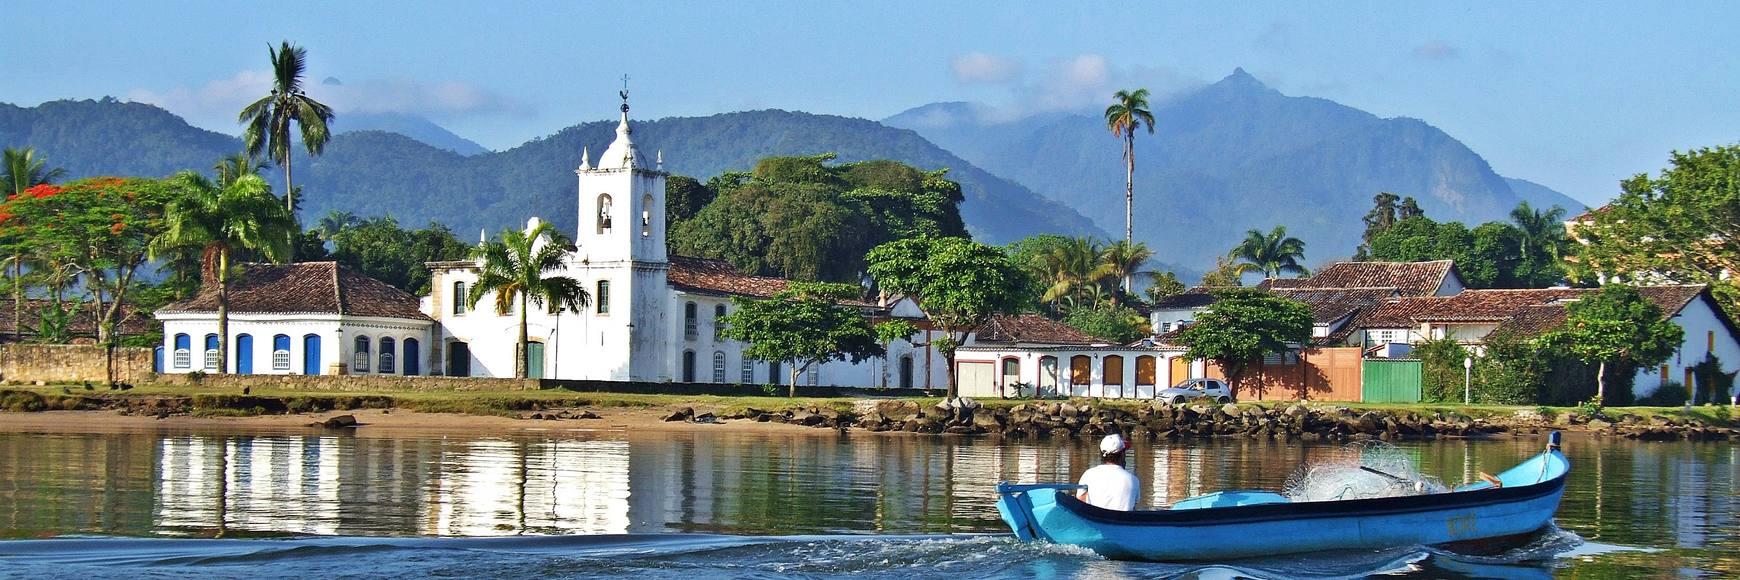 Location catamaran Brésil